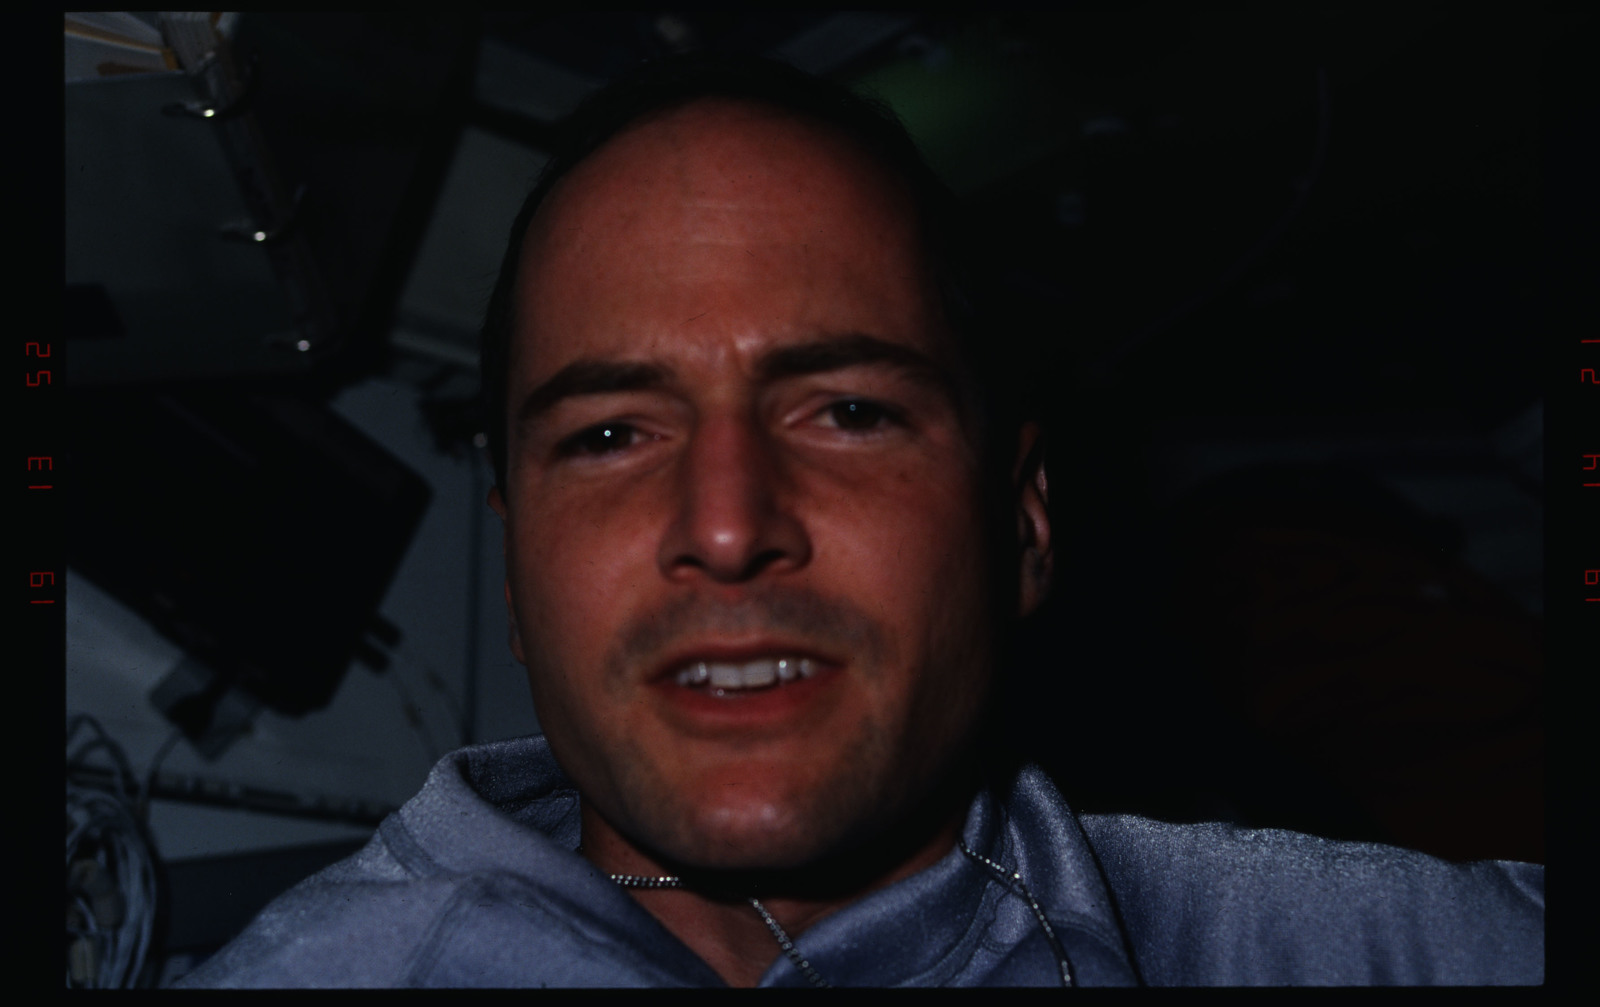 S32-01-002 - STS-032 - STS-32 crew activities